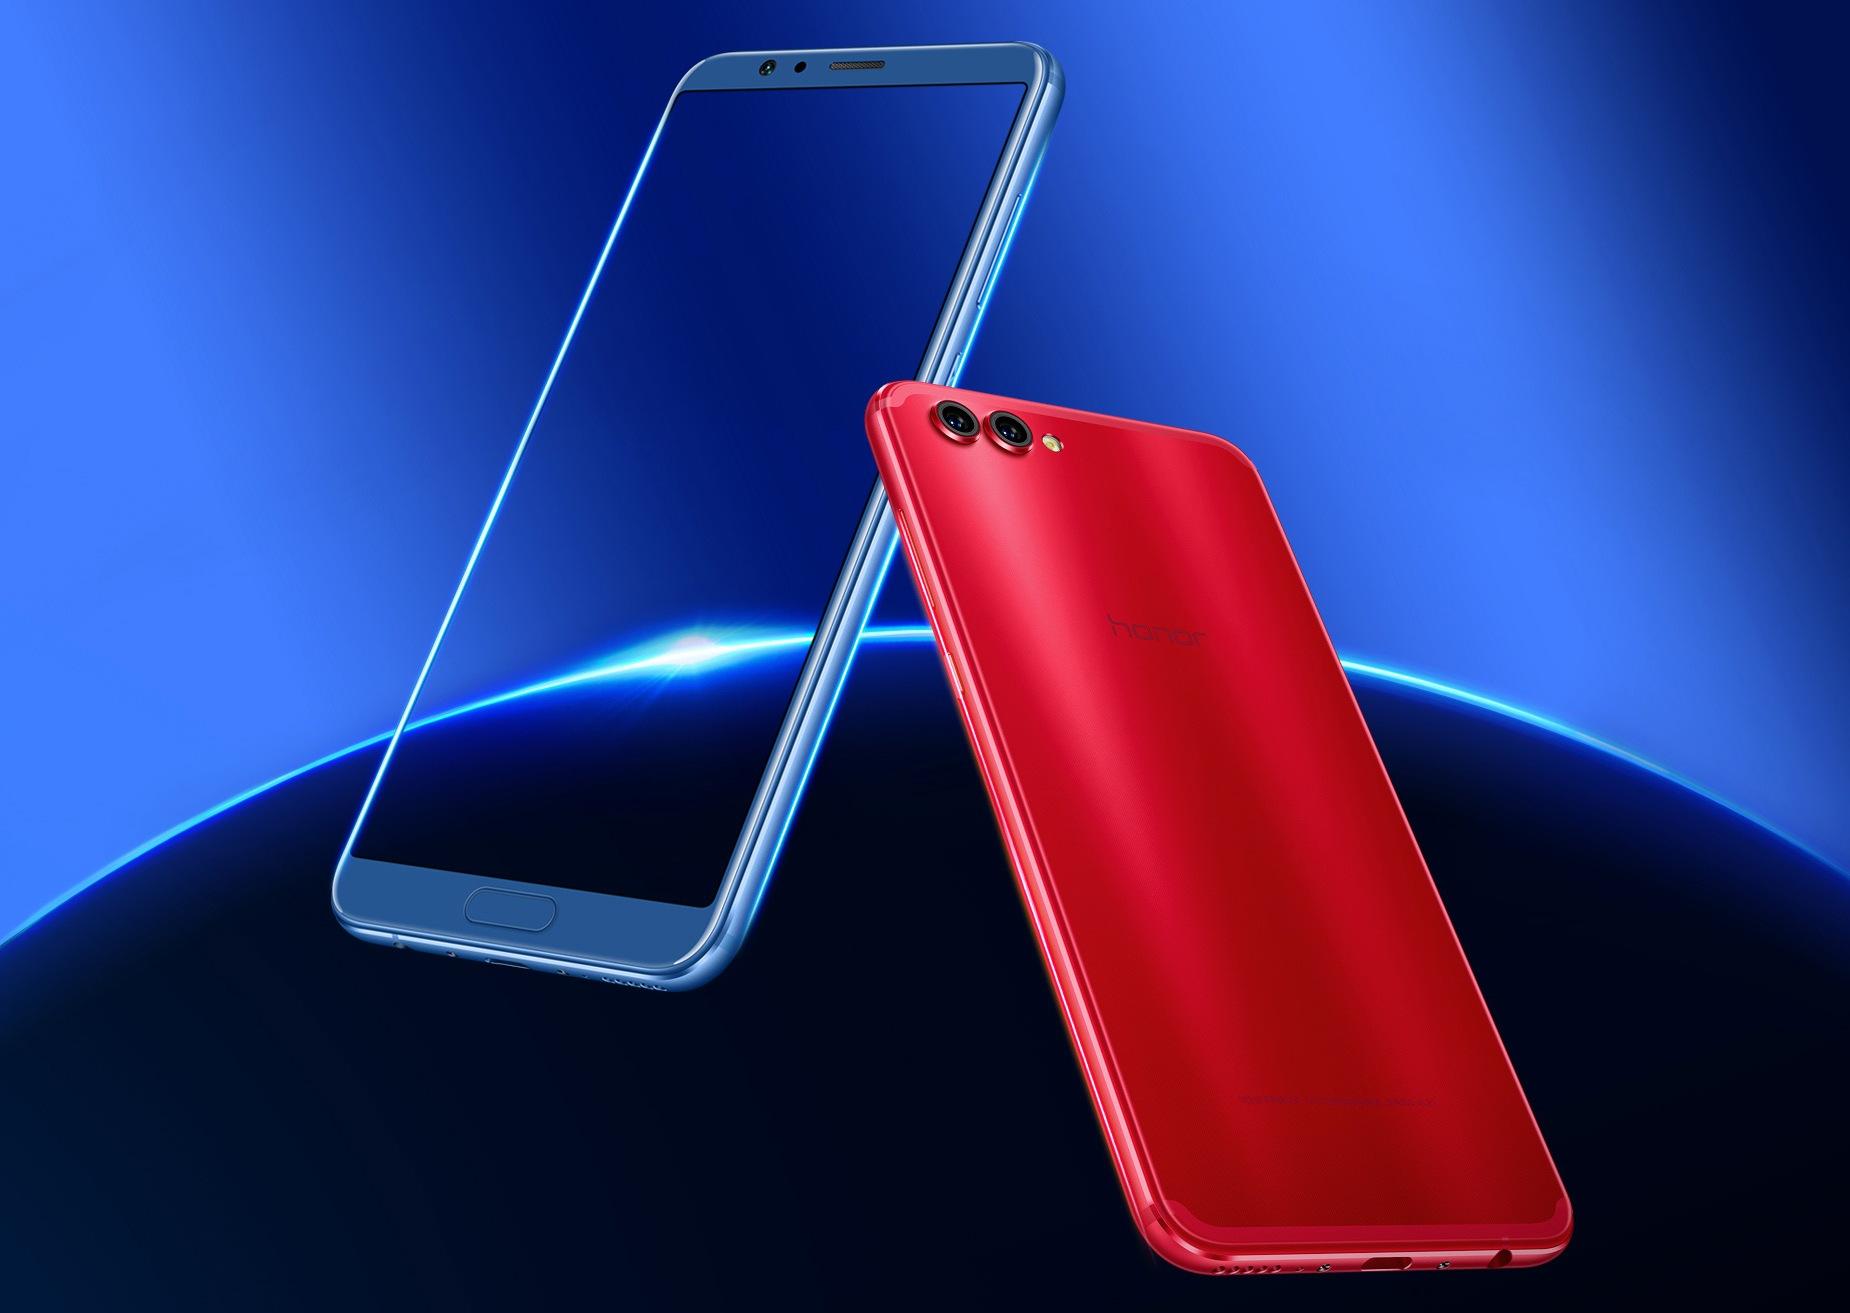 Huawei Honor V10 — объективно лучшая альтернатива OnePlus